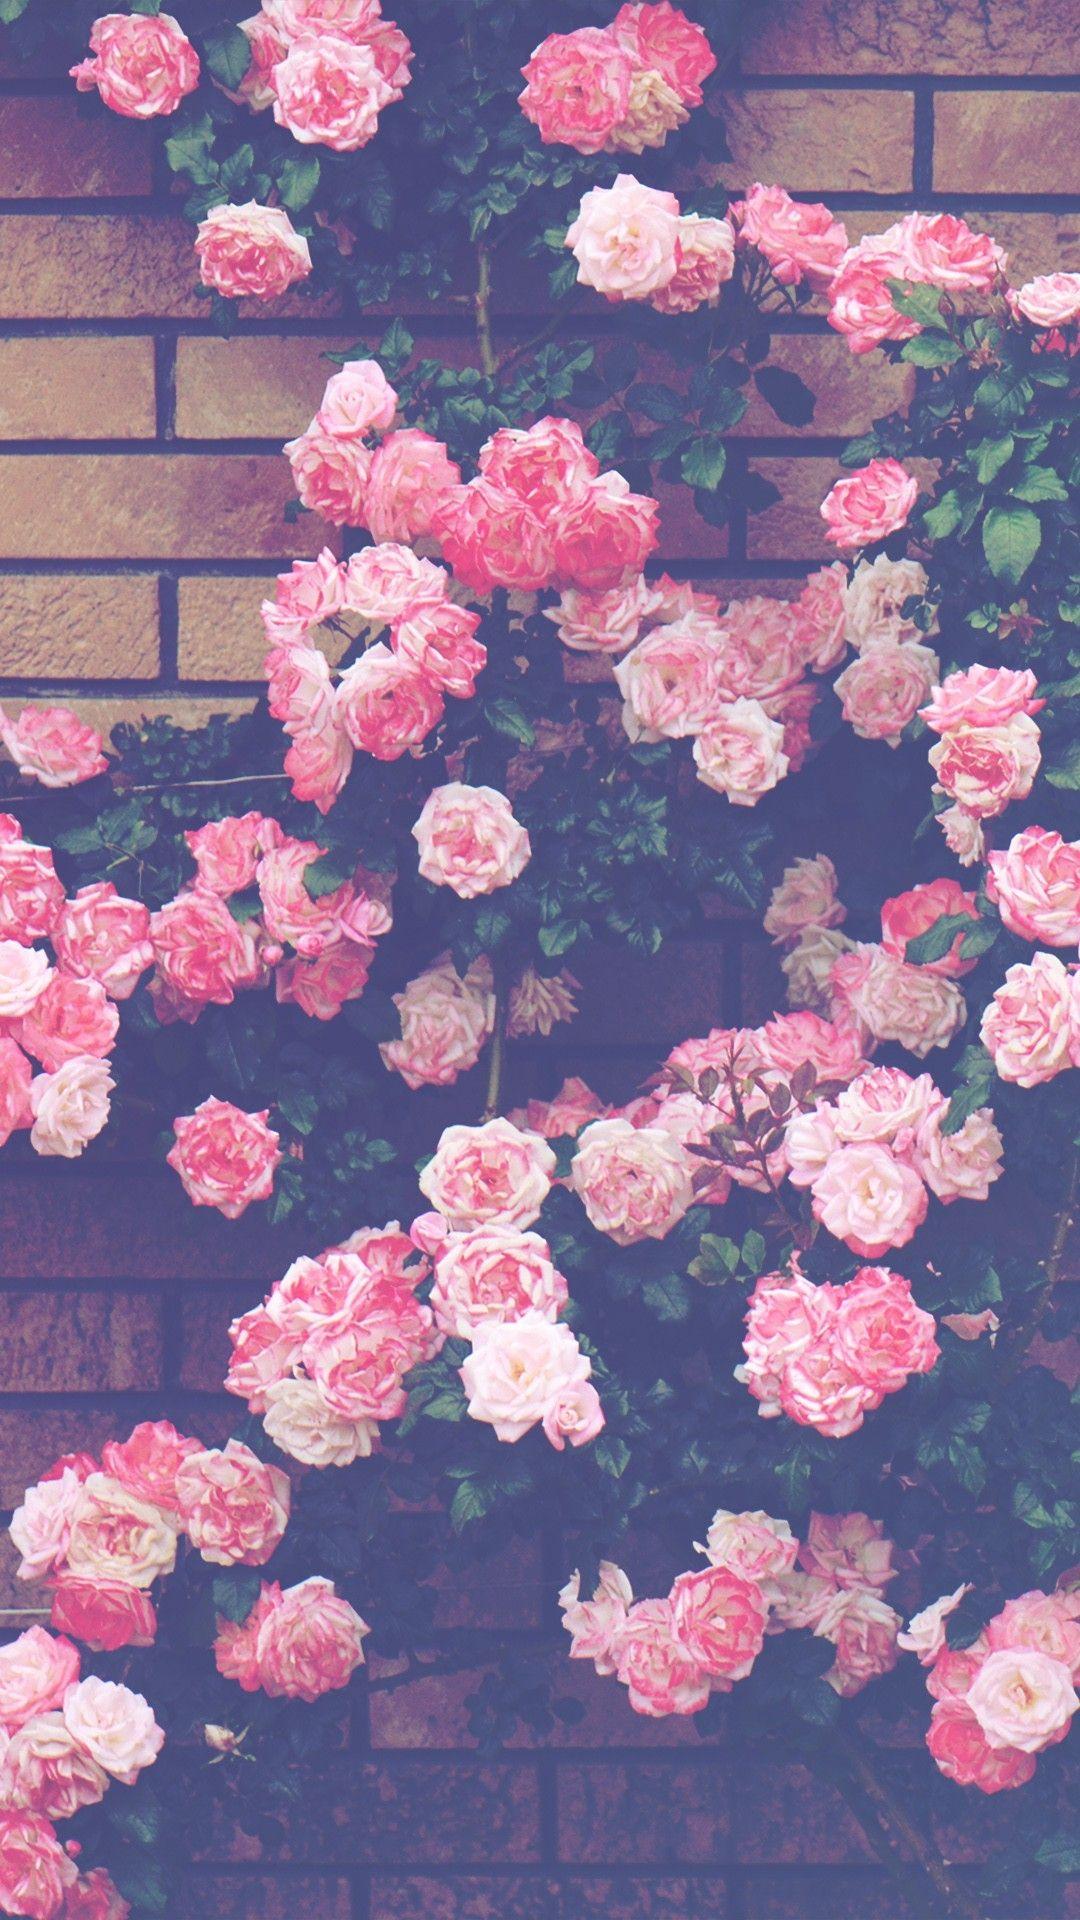 Iphone wallpaper tumblr flower - Sigueme Porfa No Cuesta Nada Ines_55 Tumblr Wallpaperpink Wallpaperflower